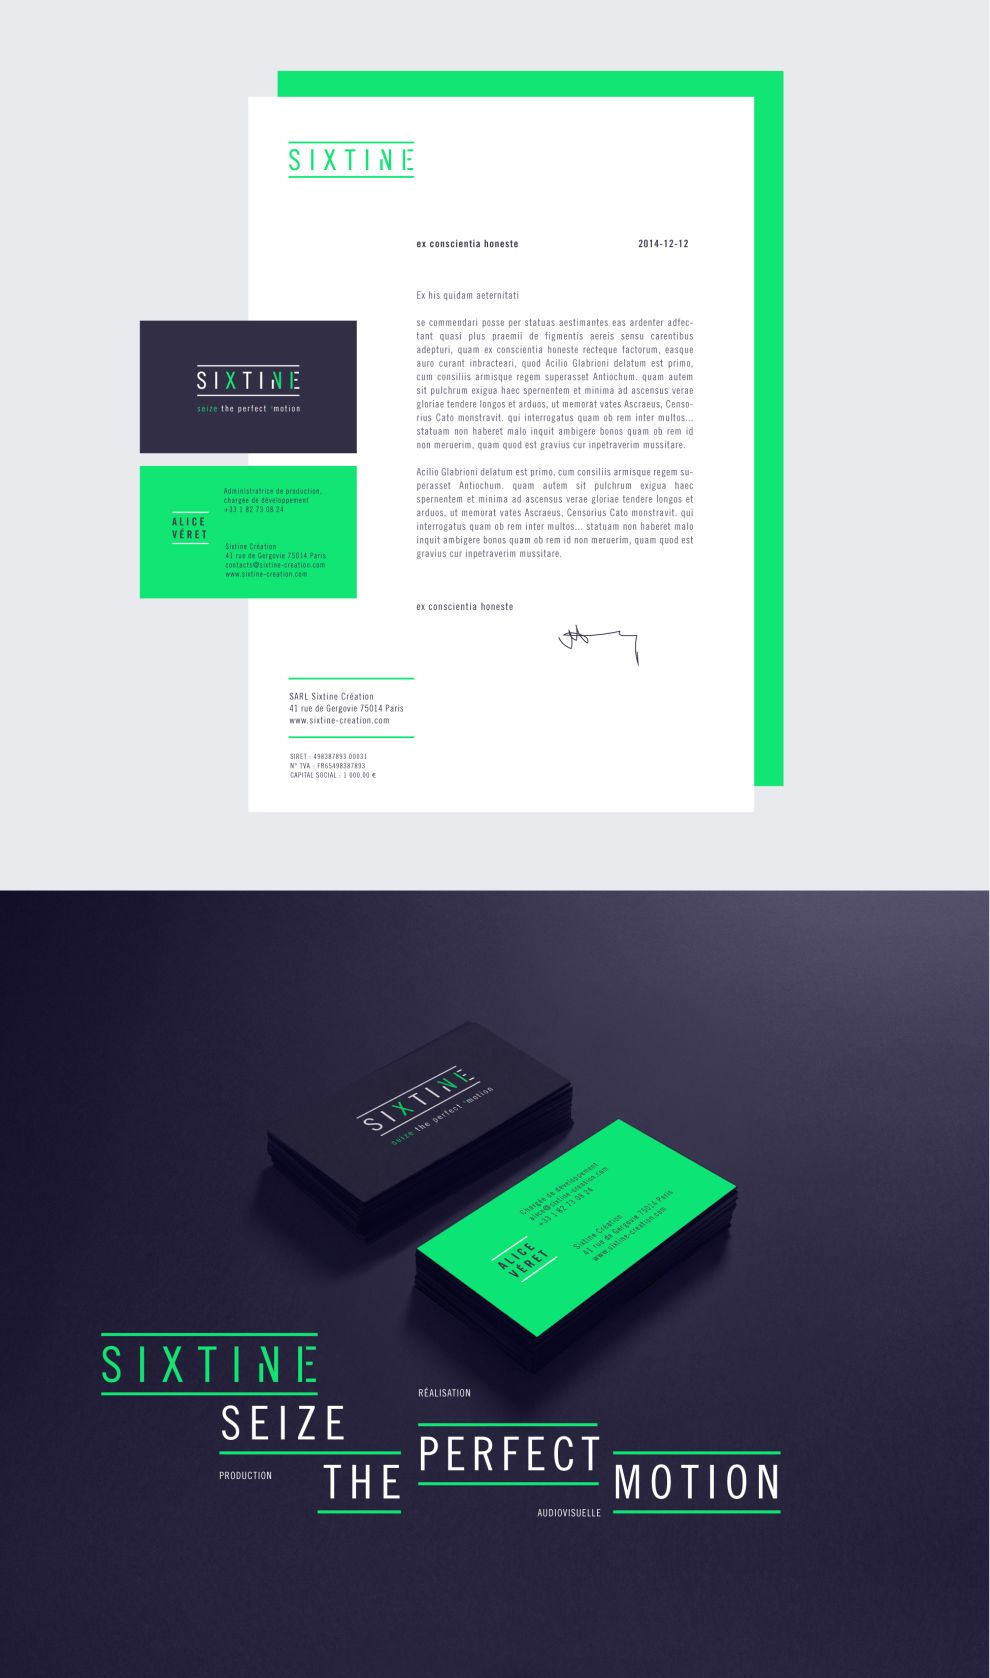 Sixtine Print Design